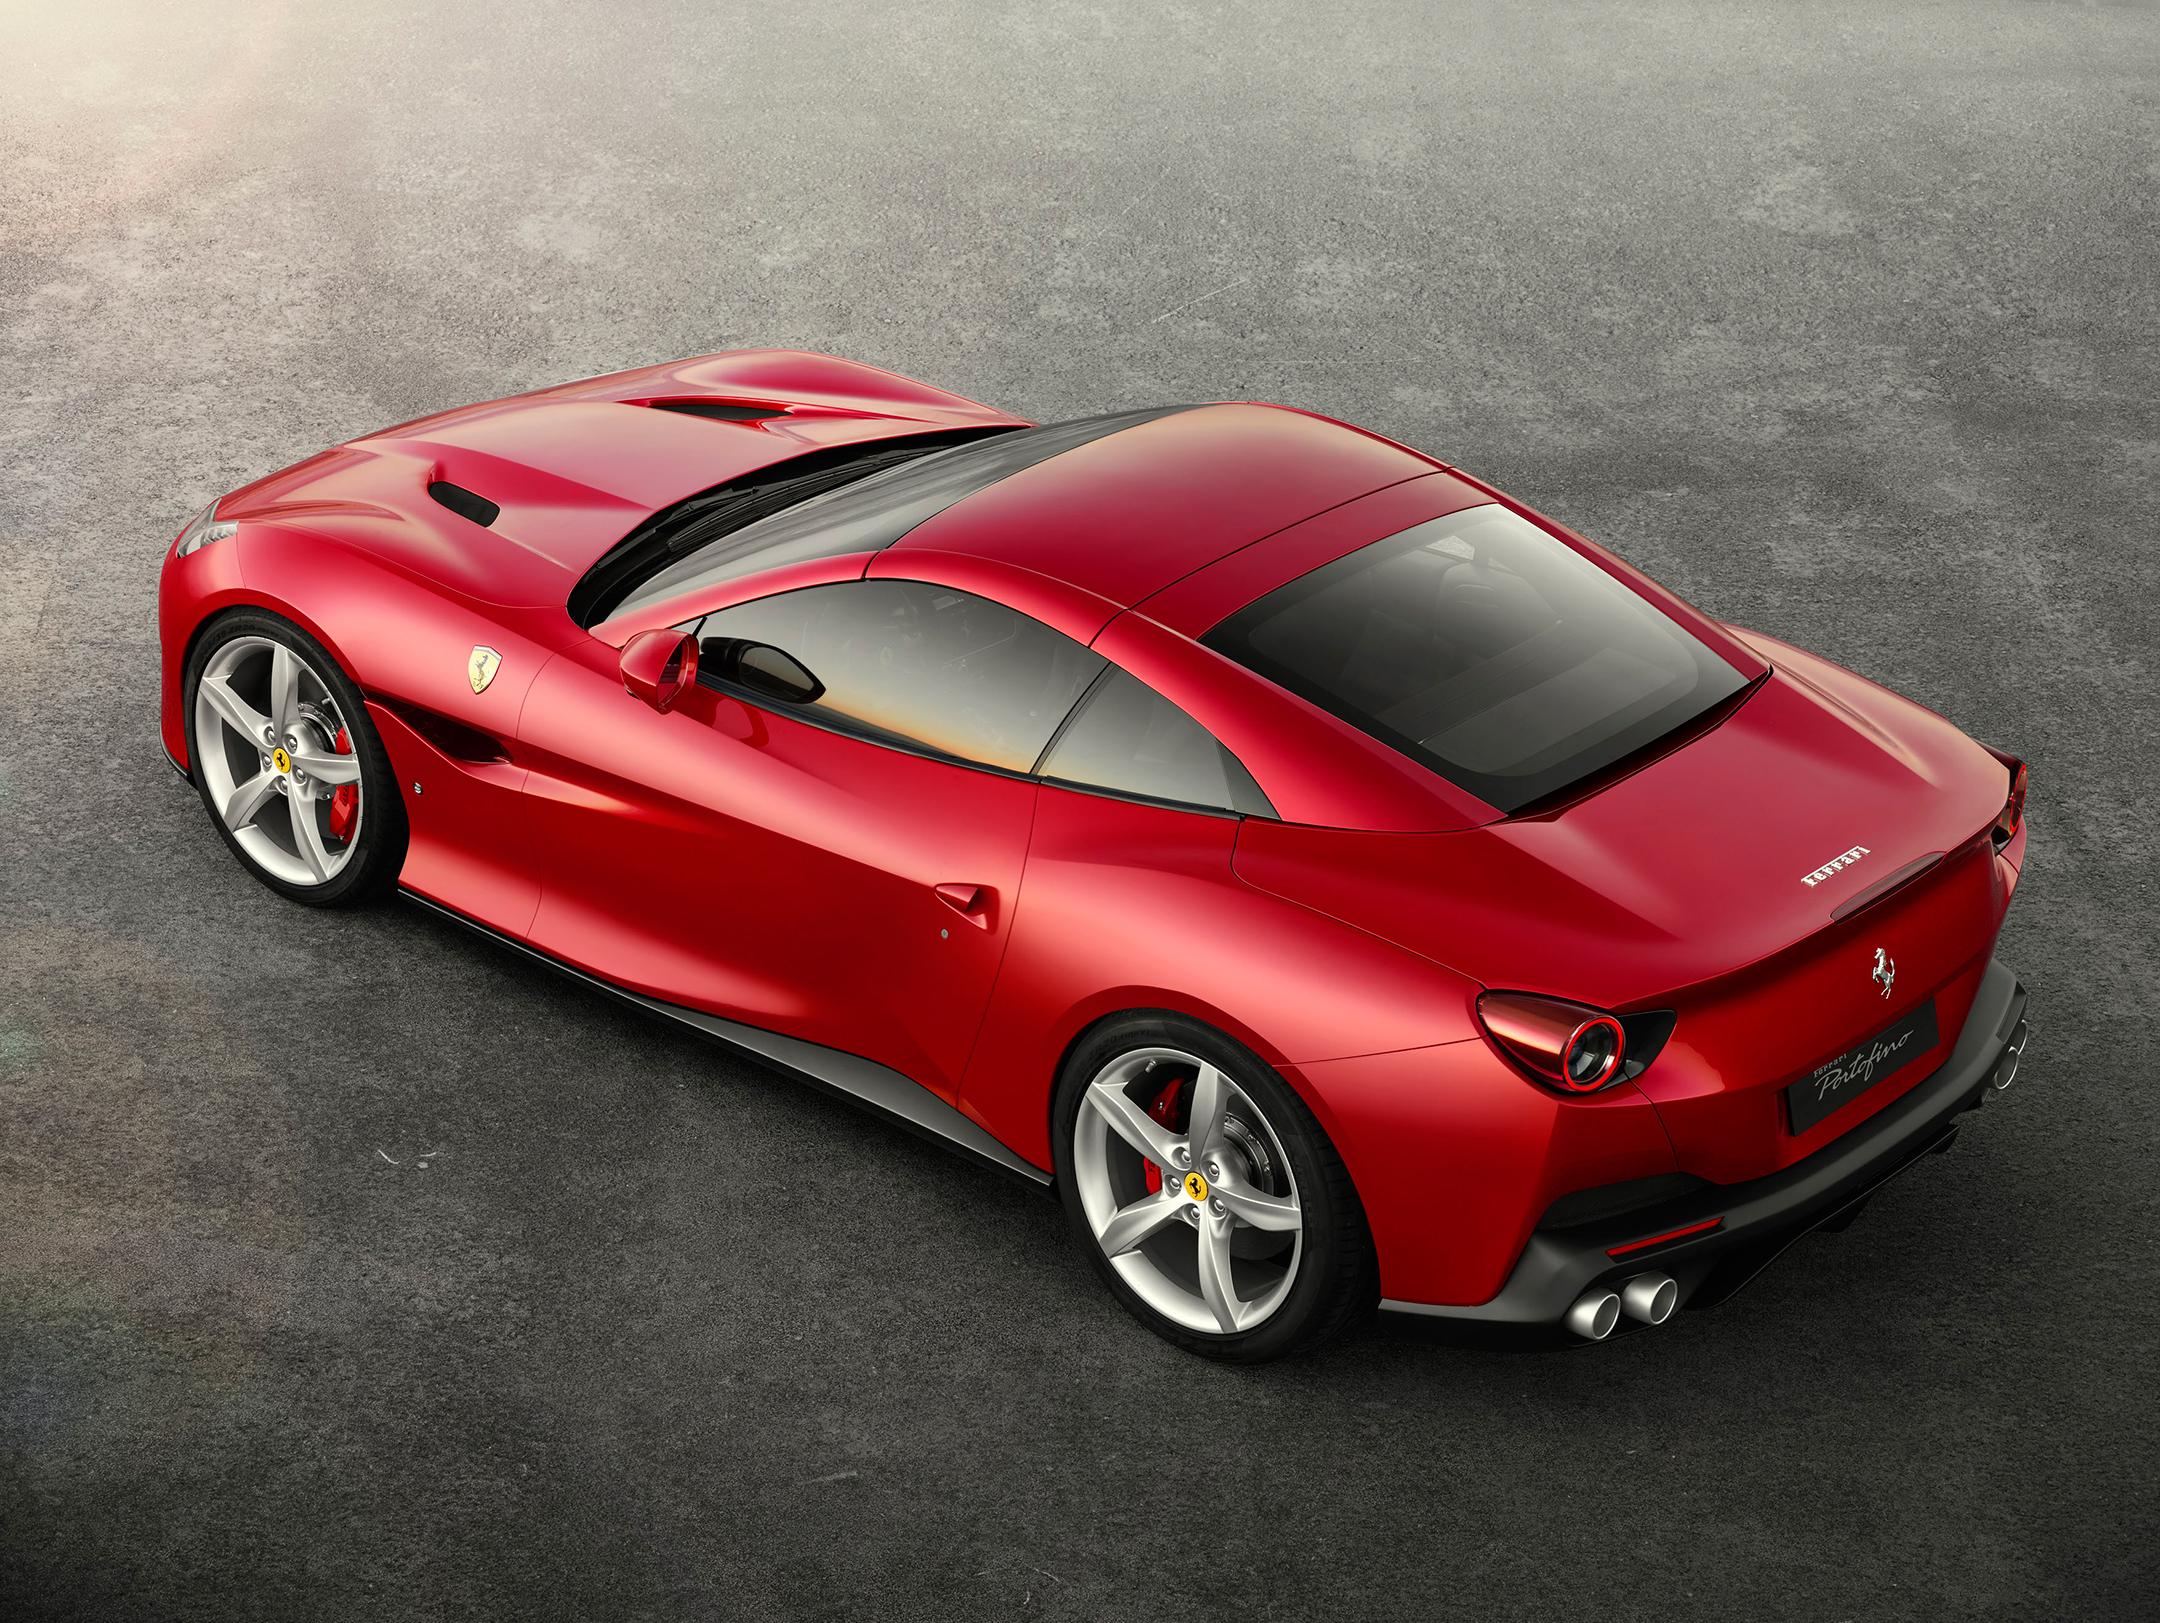 Ferrari Portofino - 2017 - rear side-face / profil arrière